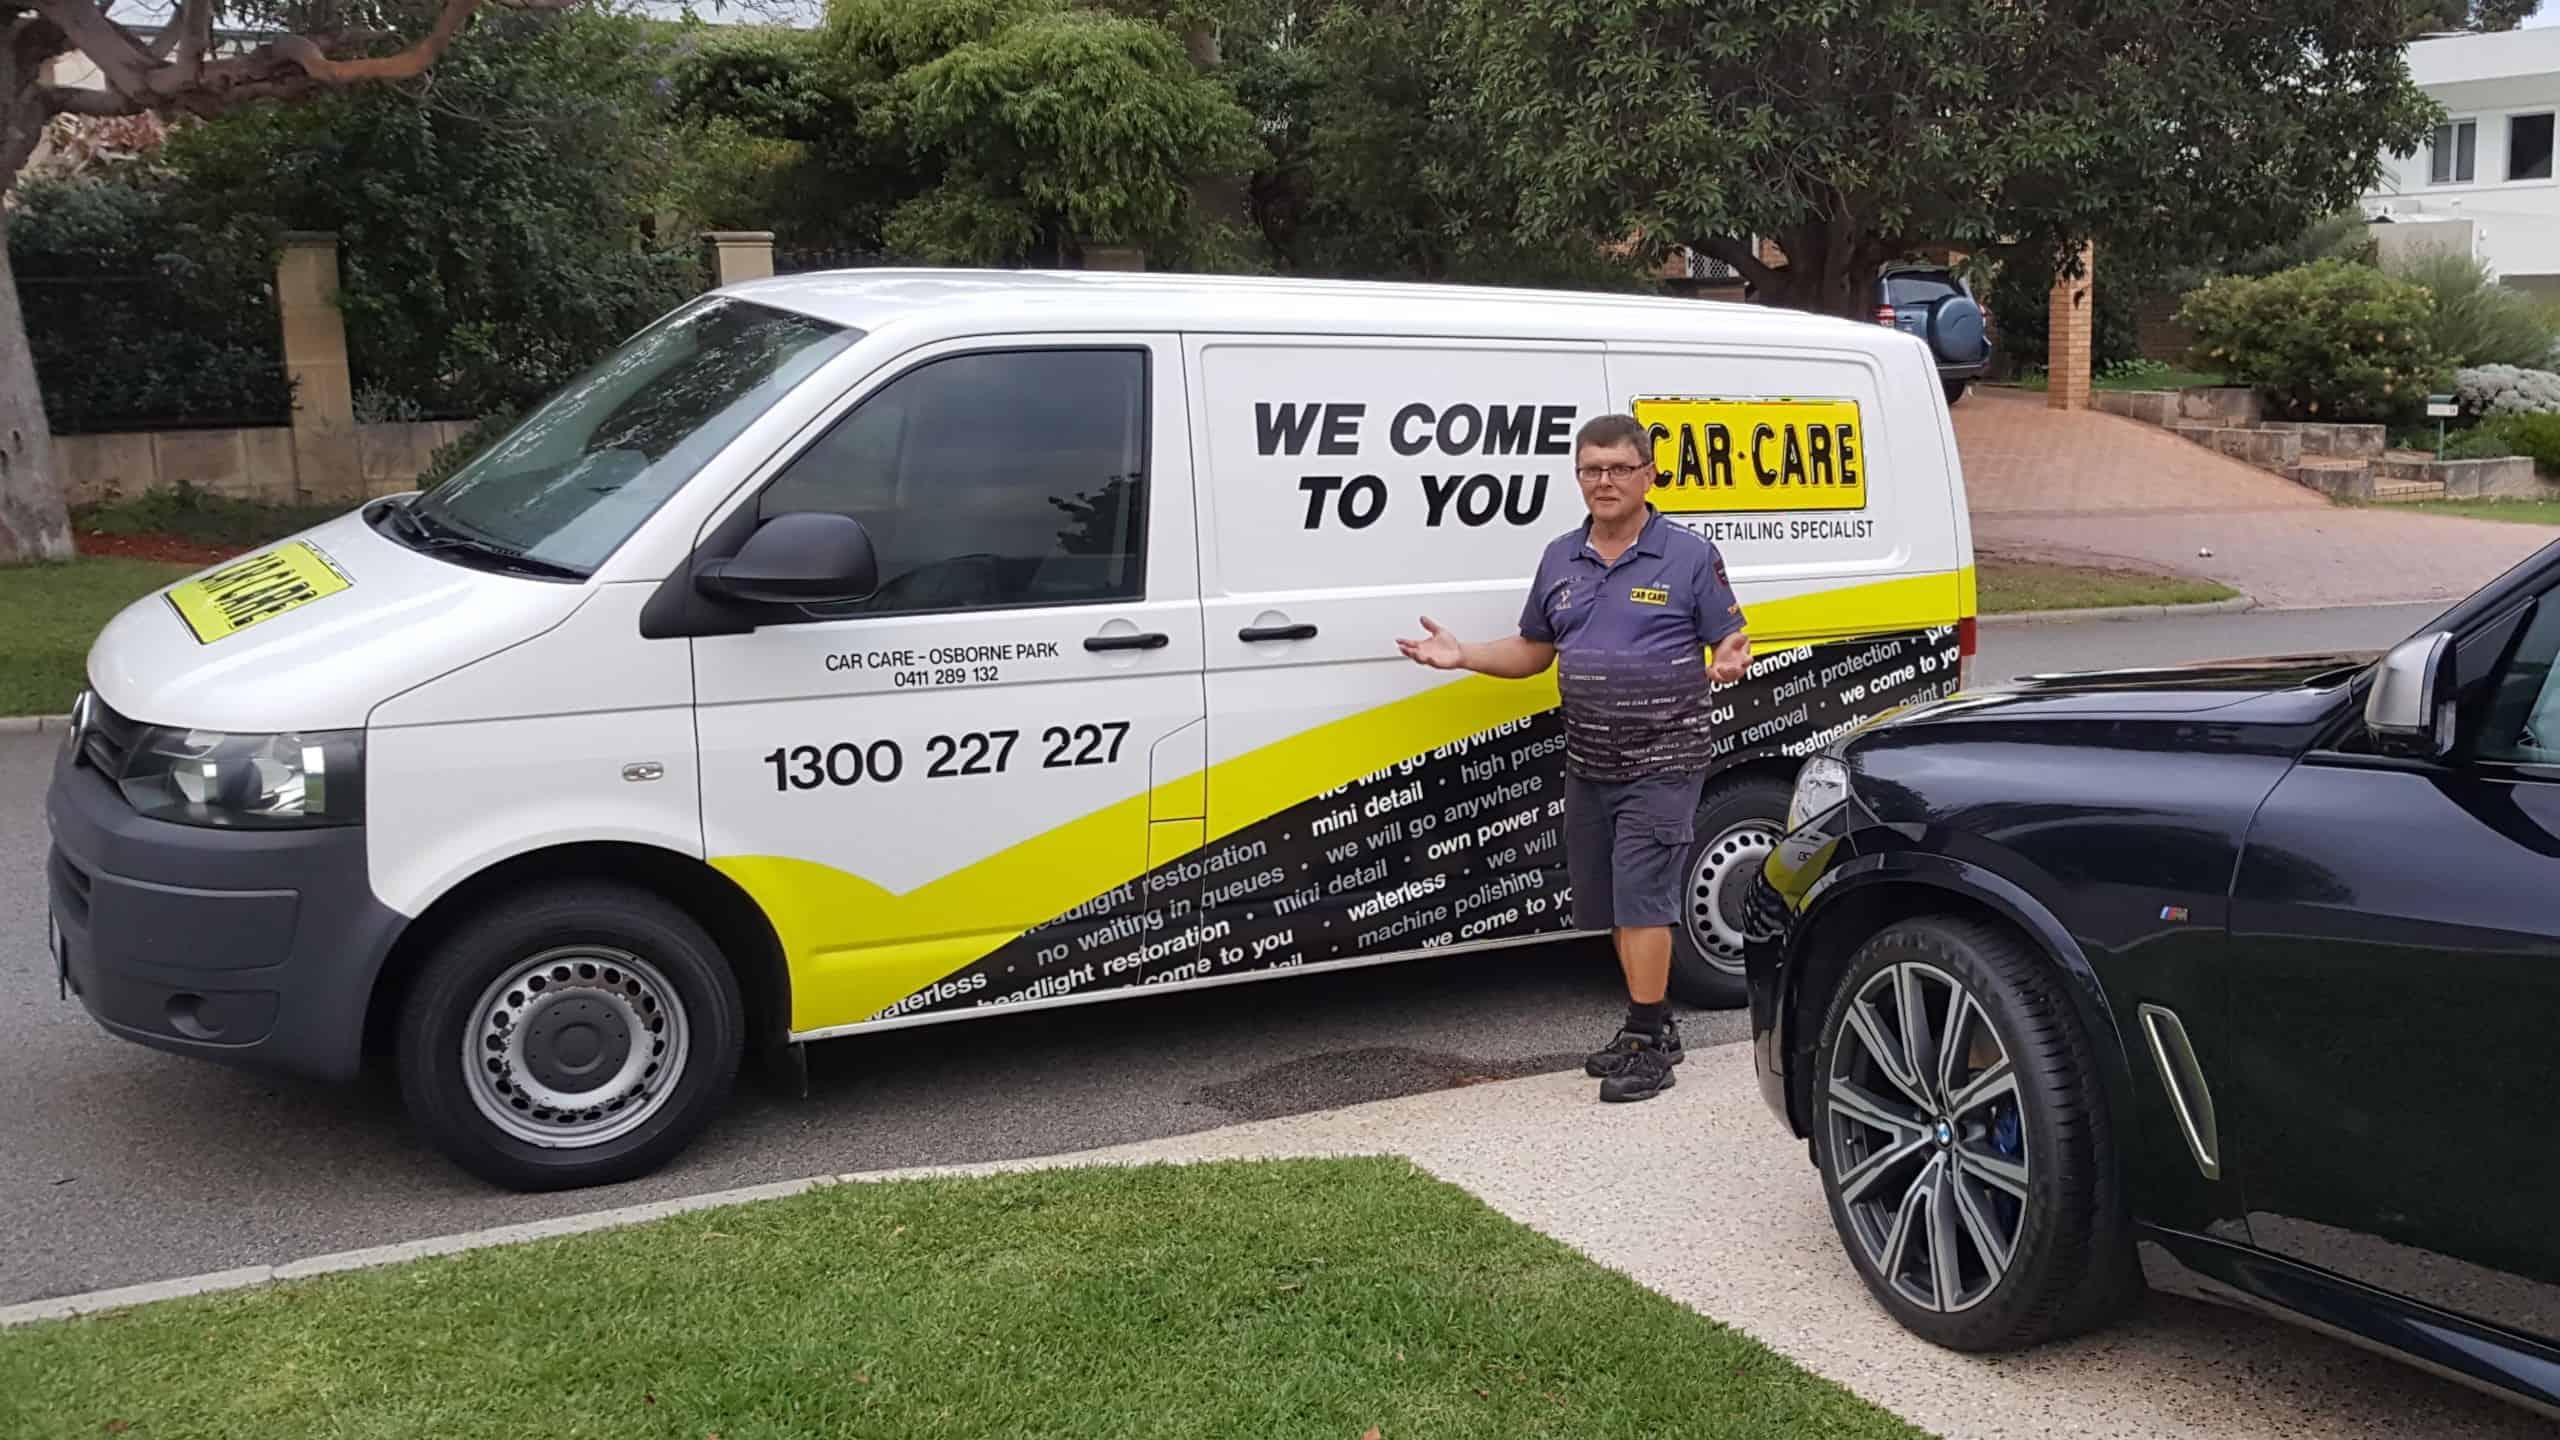 Bruce car care Osborne Park by white van